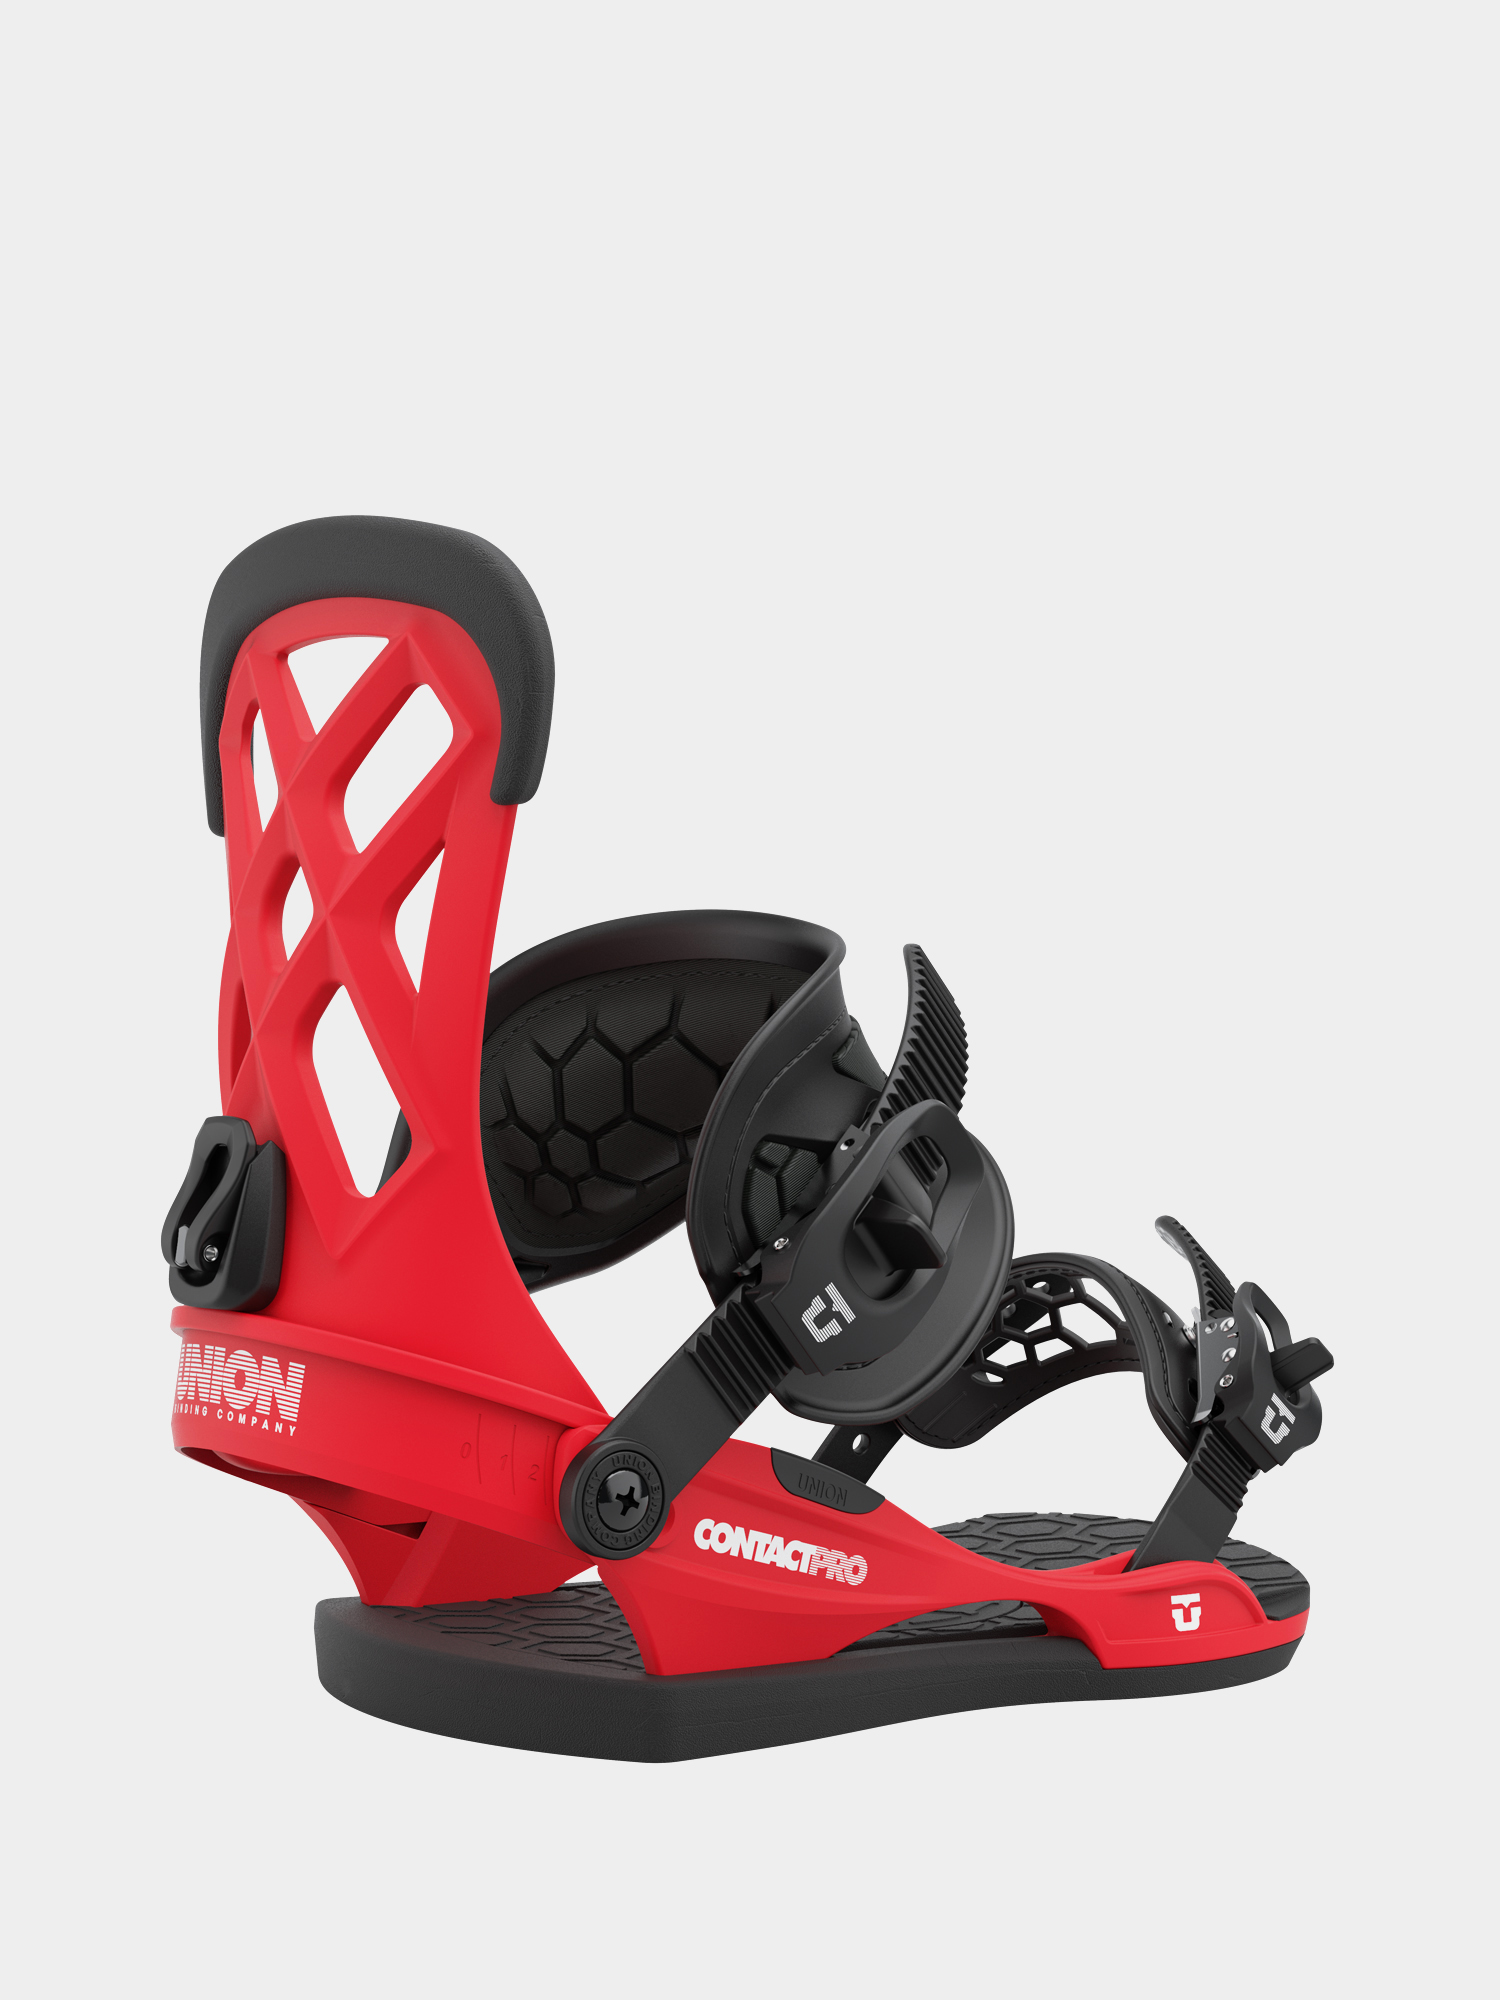 Wiu0105zania snowboardowe Union Contact Pro (red)